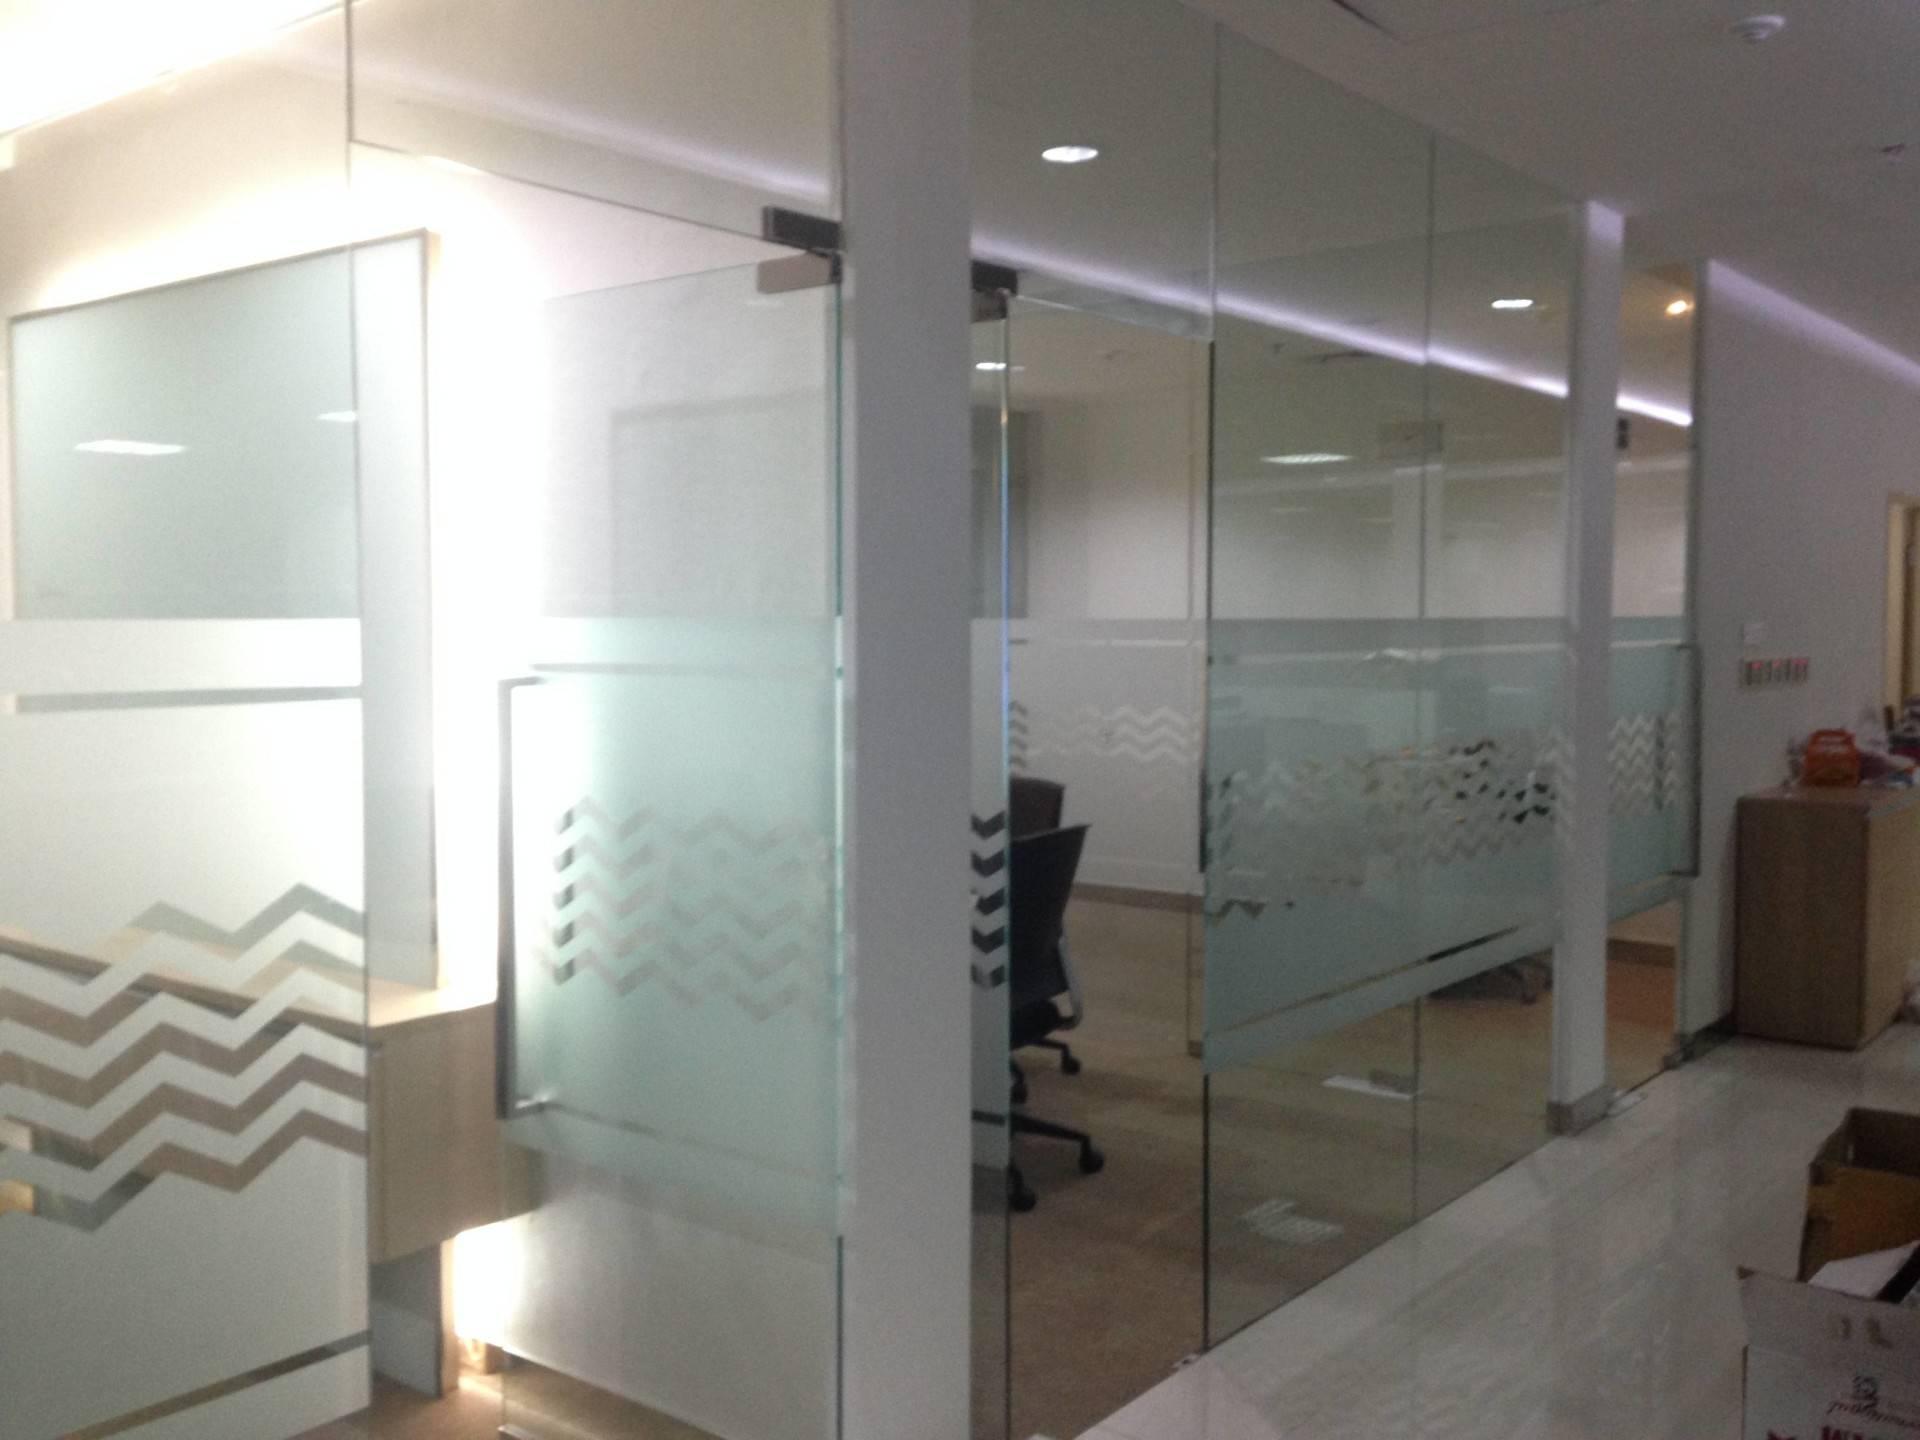 Graharupa Cipta Kirana Kuc_Office Apl Ot, Jakarta Apl Ot, Jakarta Img7784 Modern  6332